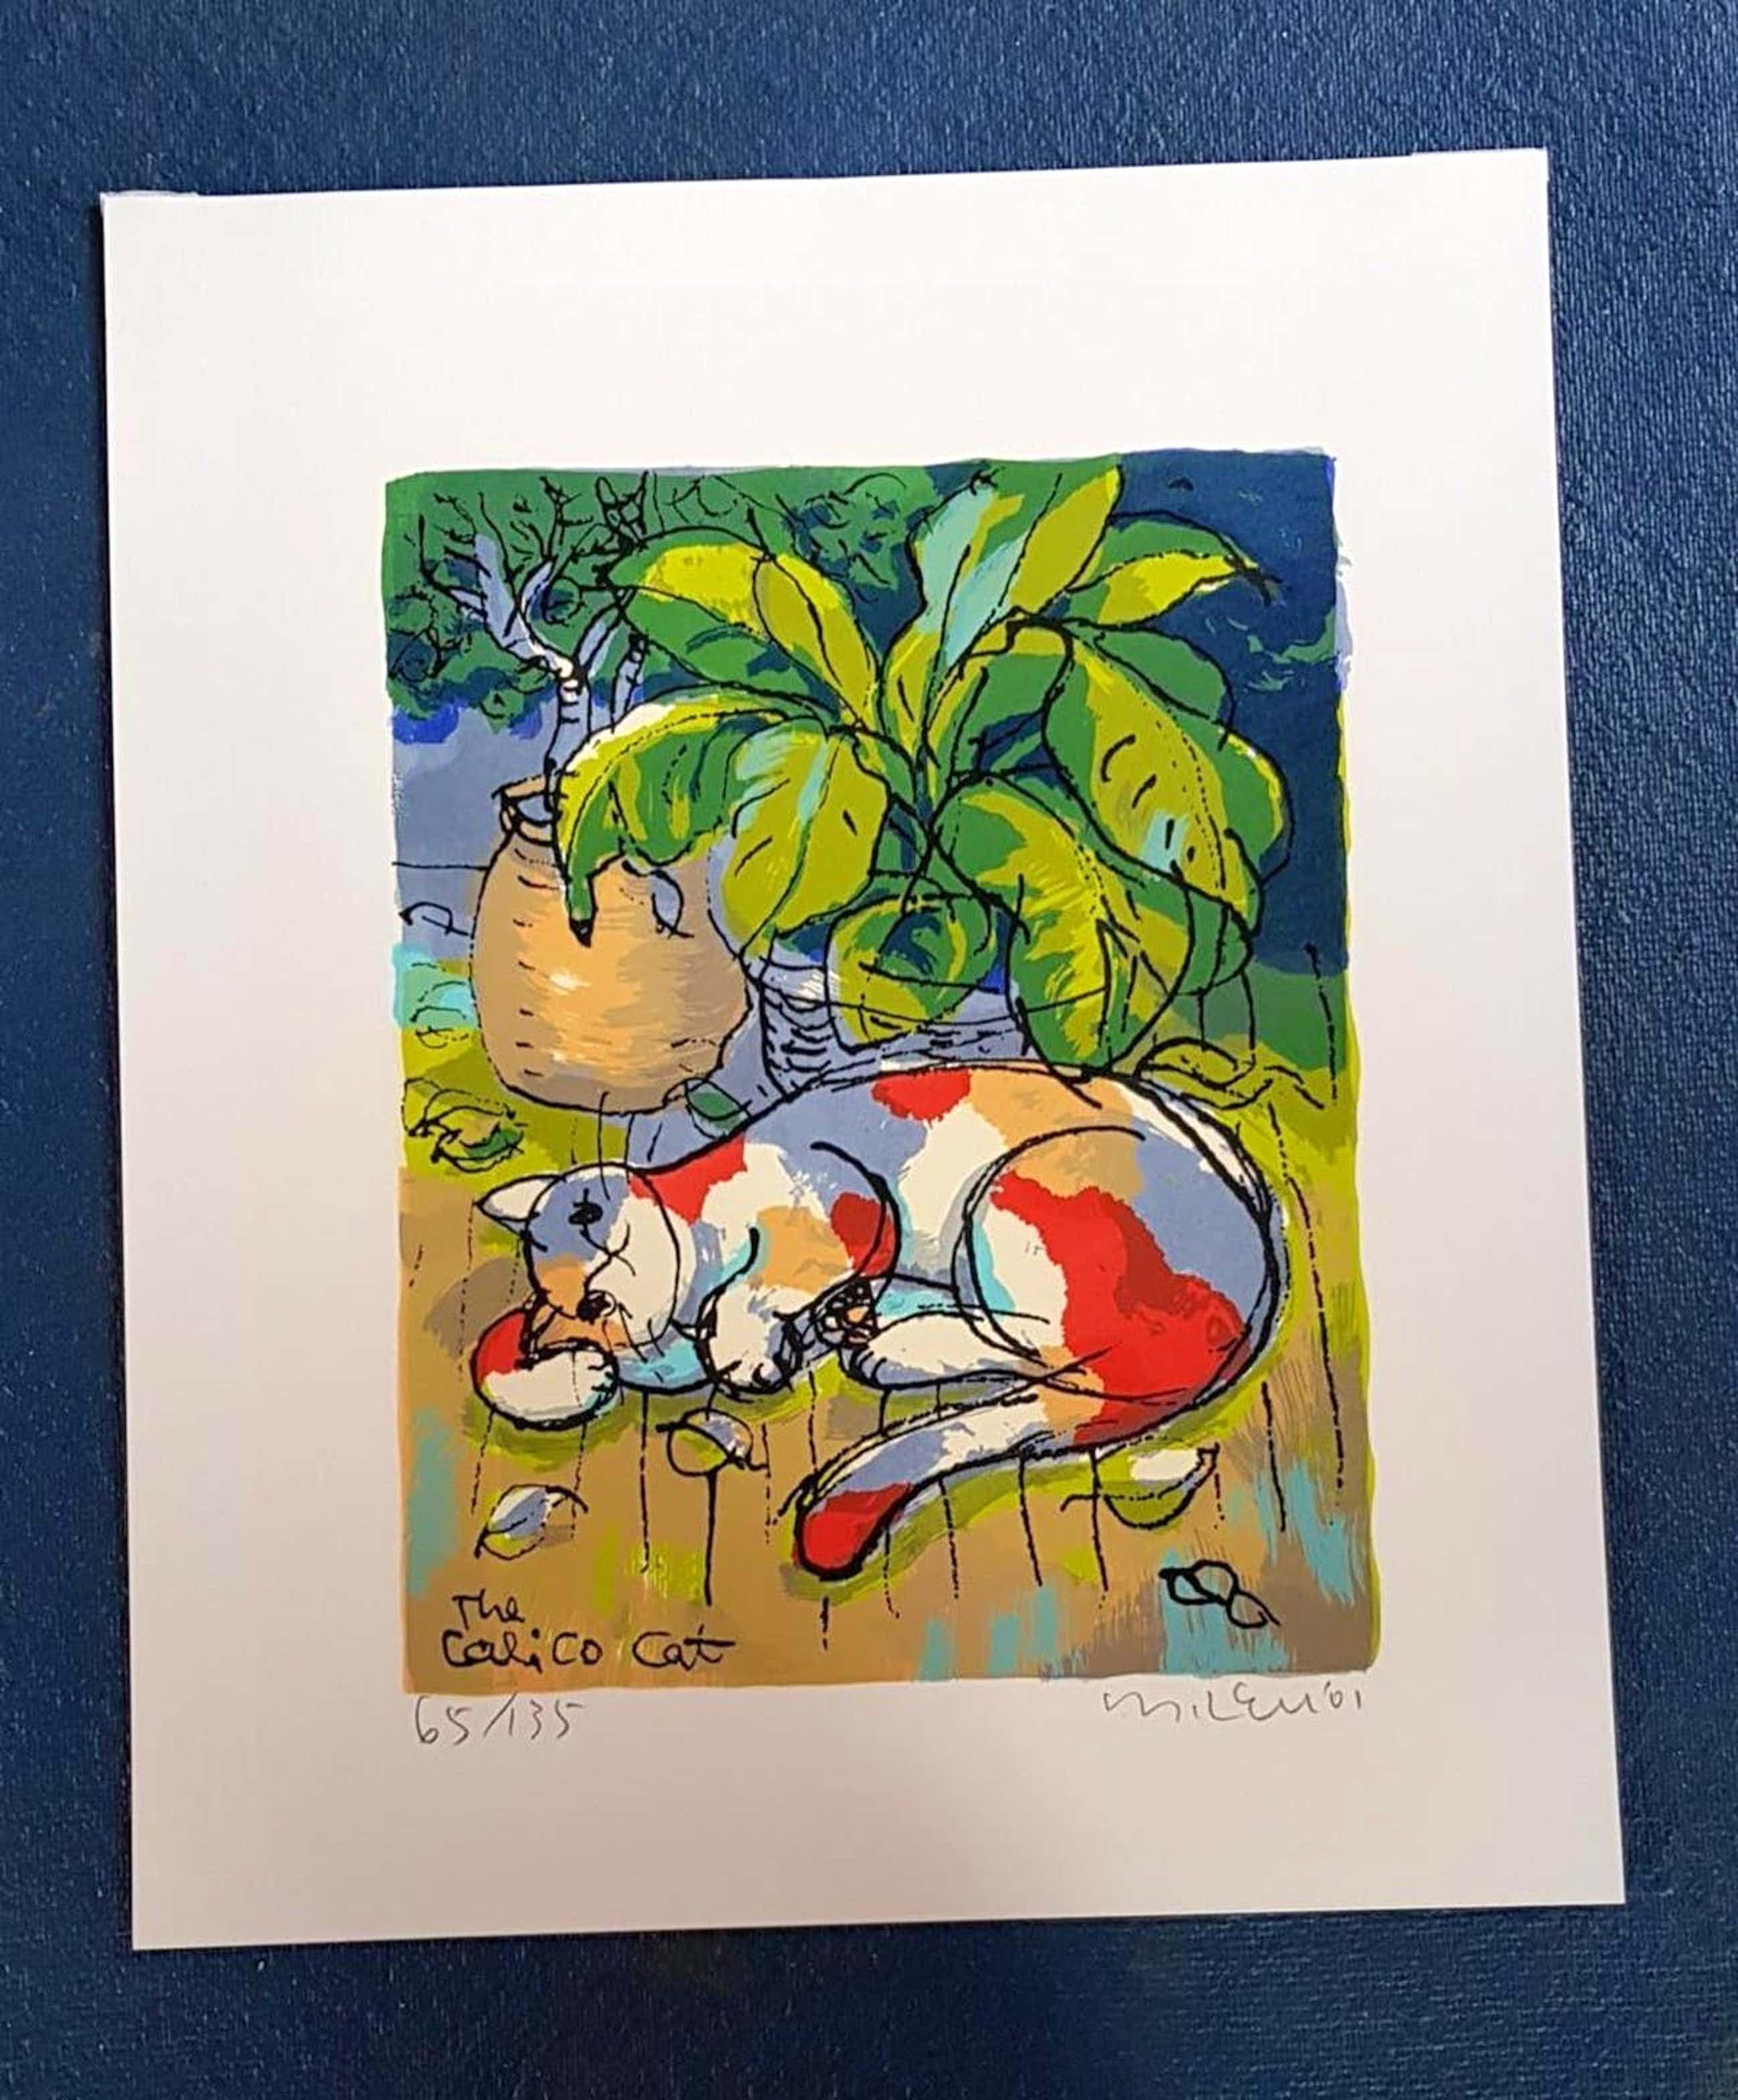 Michael Leu - The Calico Cat, Serigrafie 2001 kopen? Bied vanaf 130!